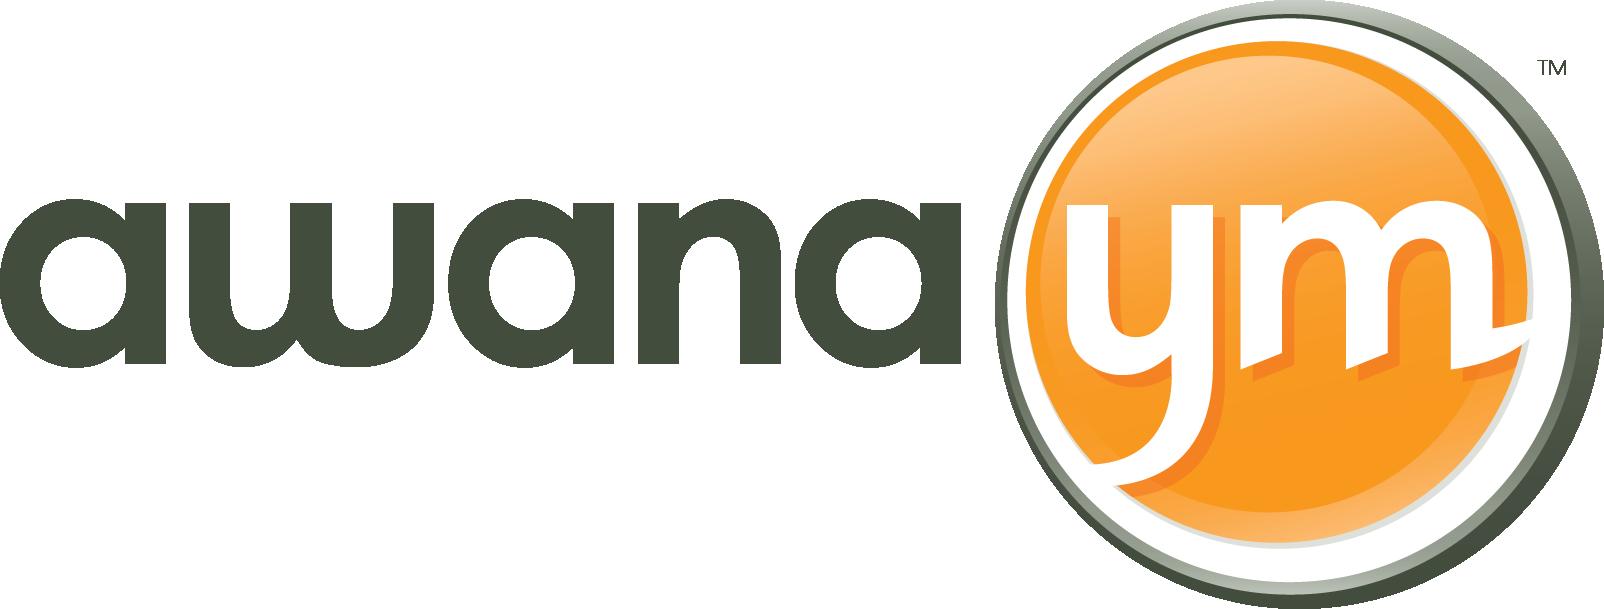 Store Clipart Awana - Awana Sparks - 640x480 PNG Download - PNGkit